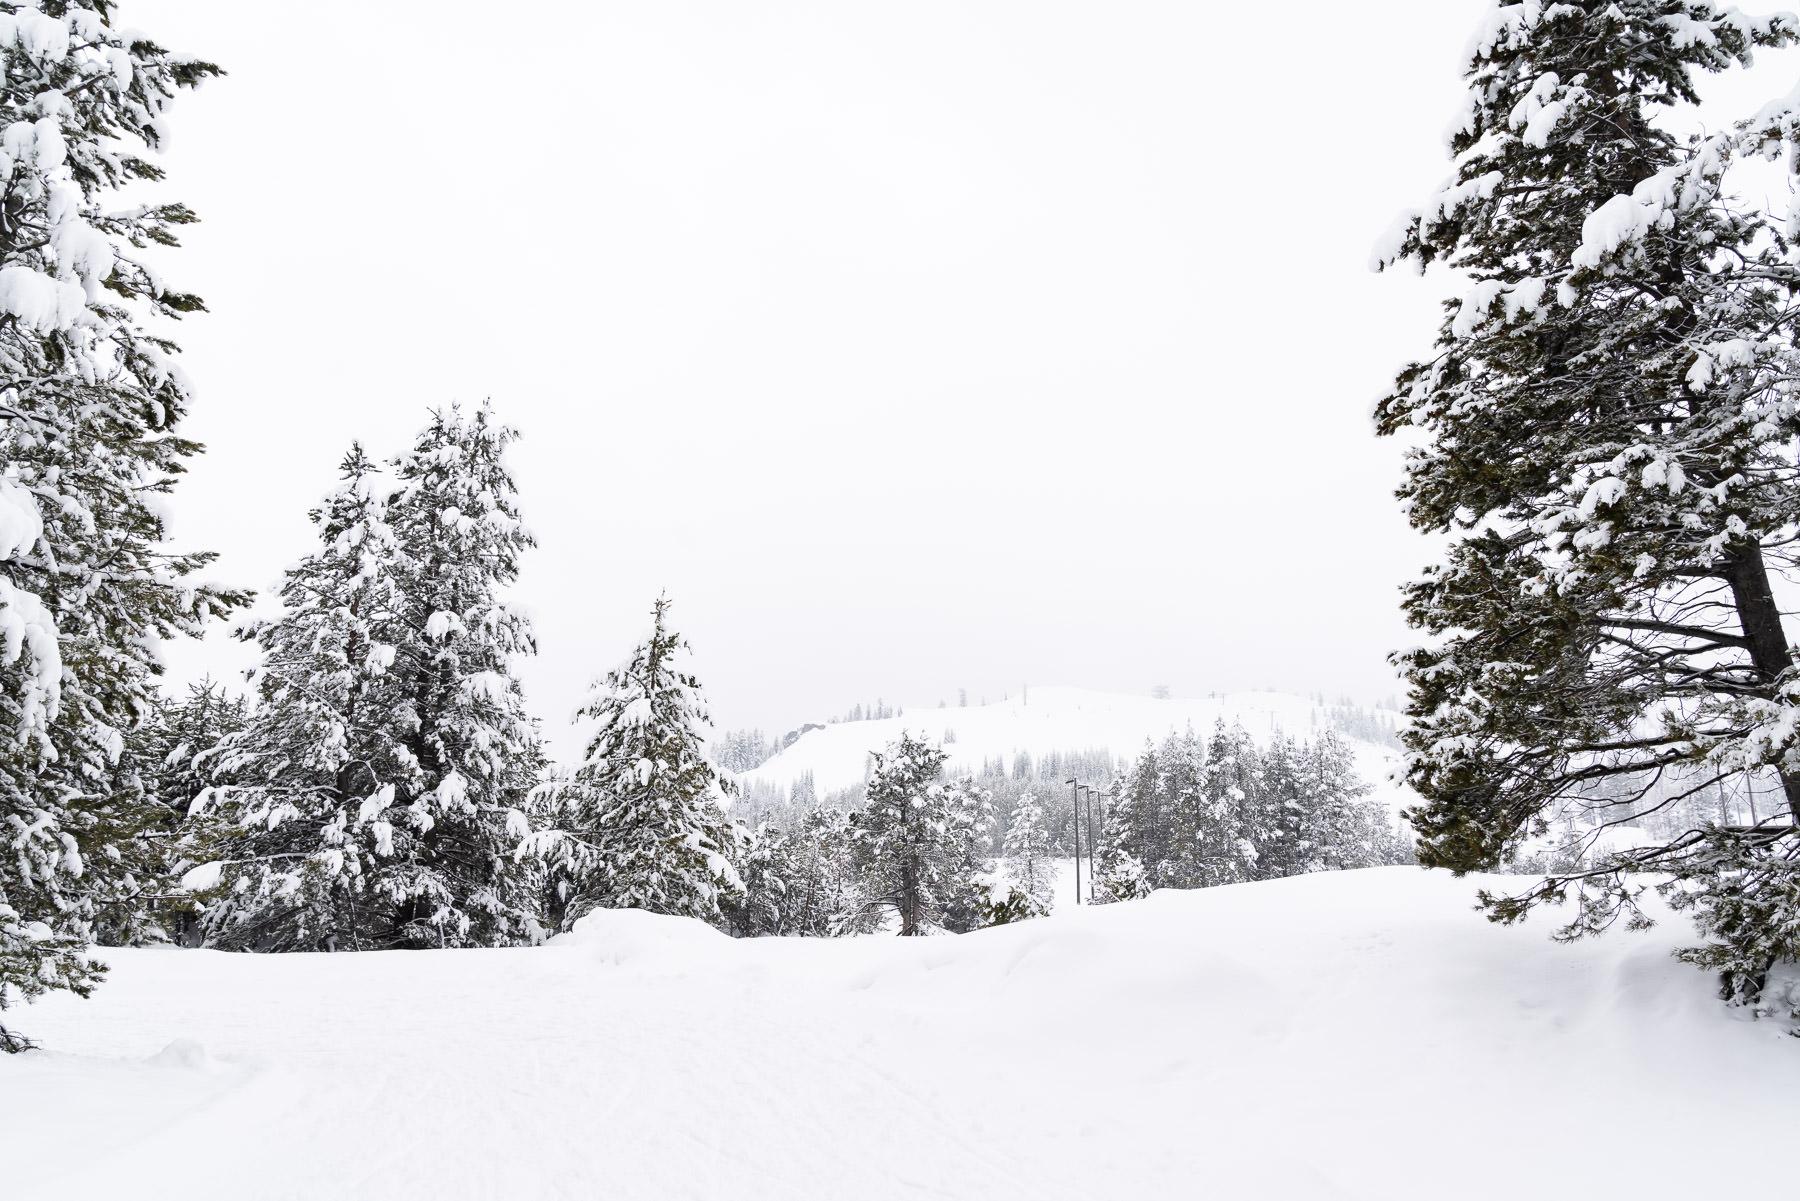 2019.03.23 Snowy Tahoe © Jennifer Carr Photography-14.jpg